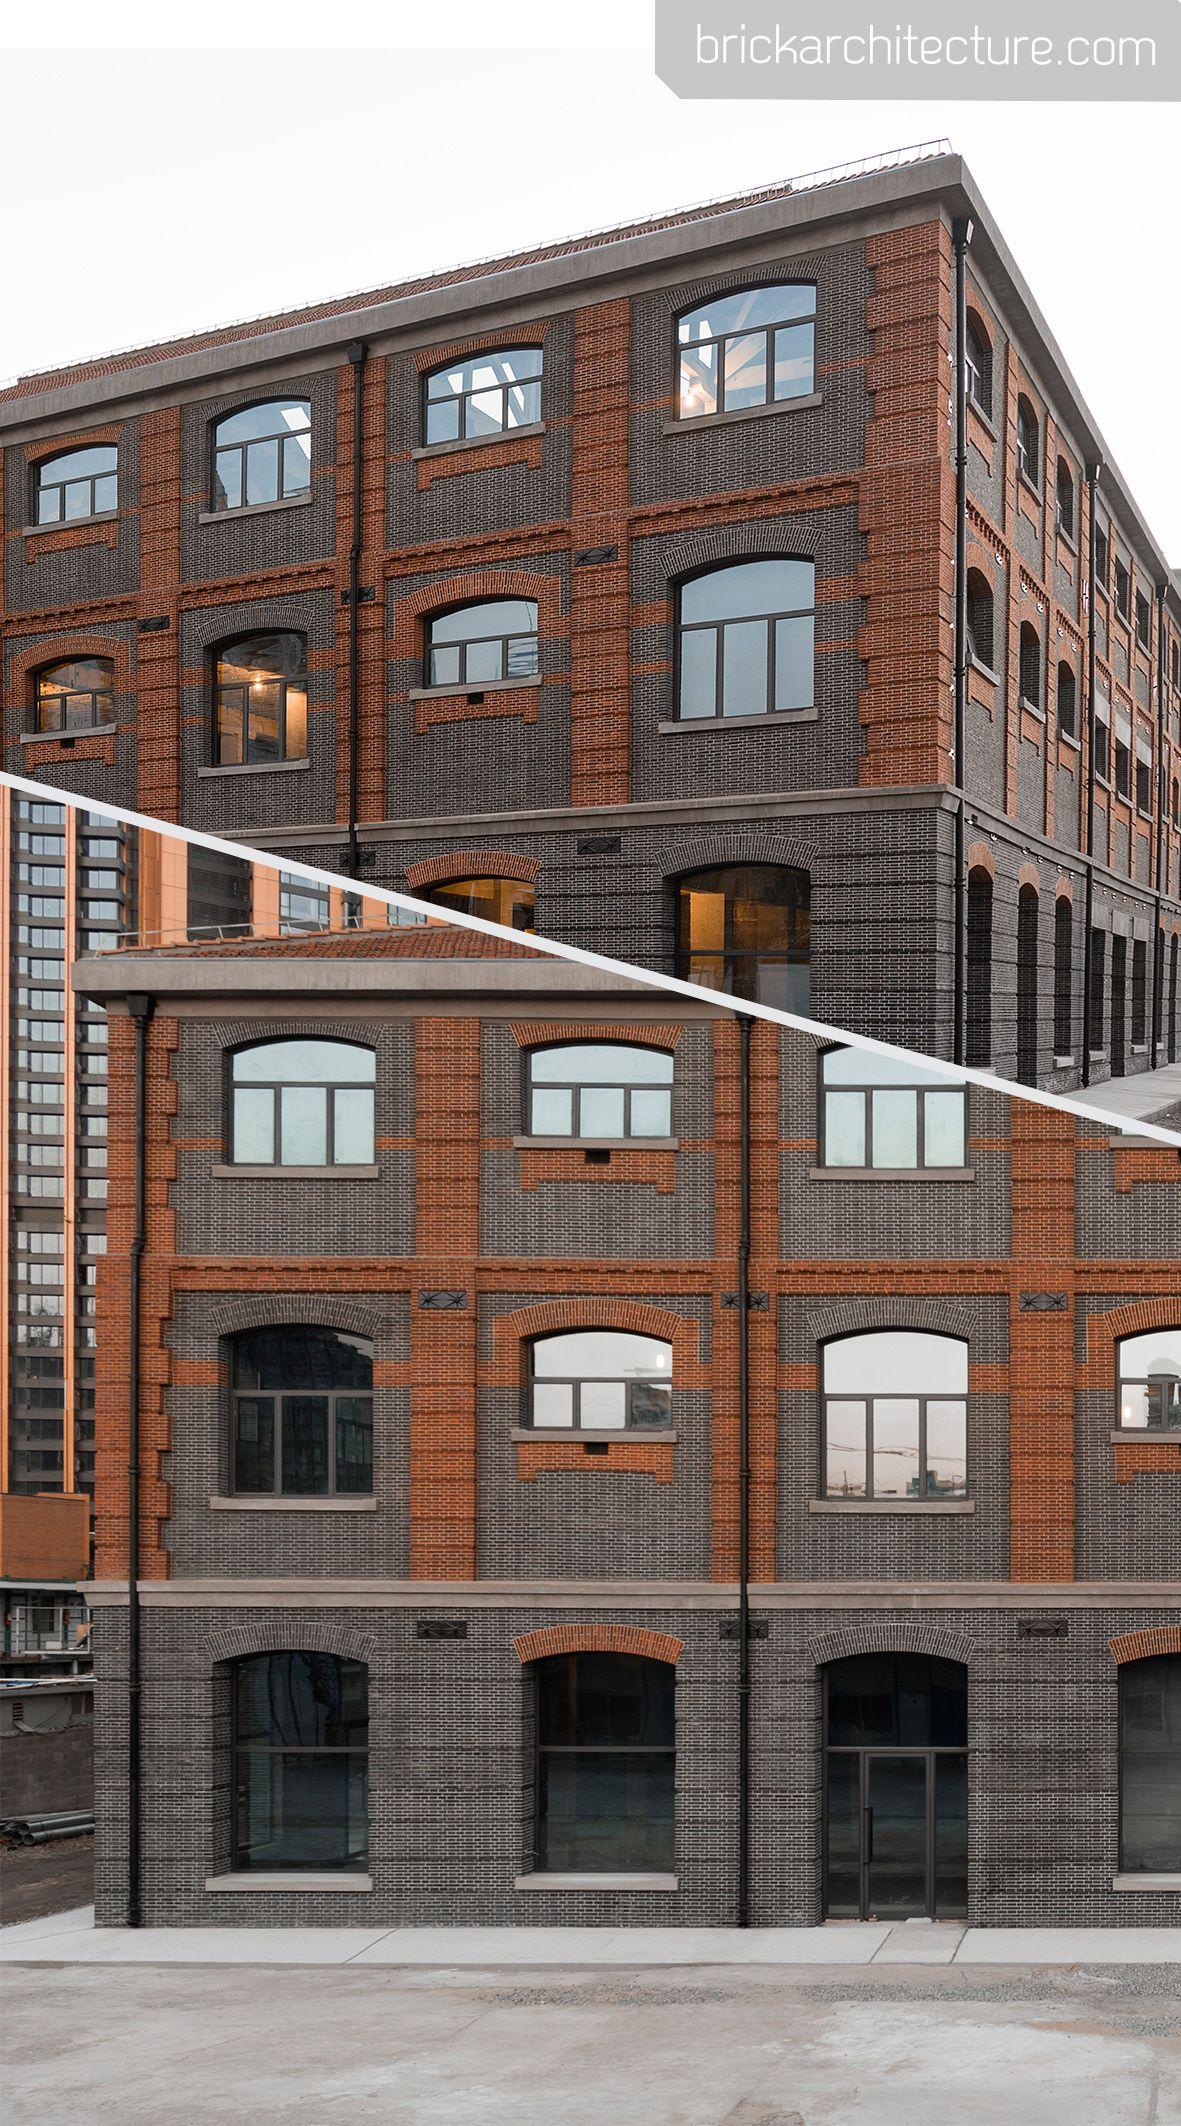 Xintai Warehouse Kokaistudios Urban Fabric Brick Architecture Hotel Exterior